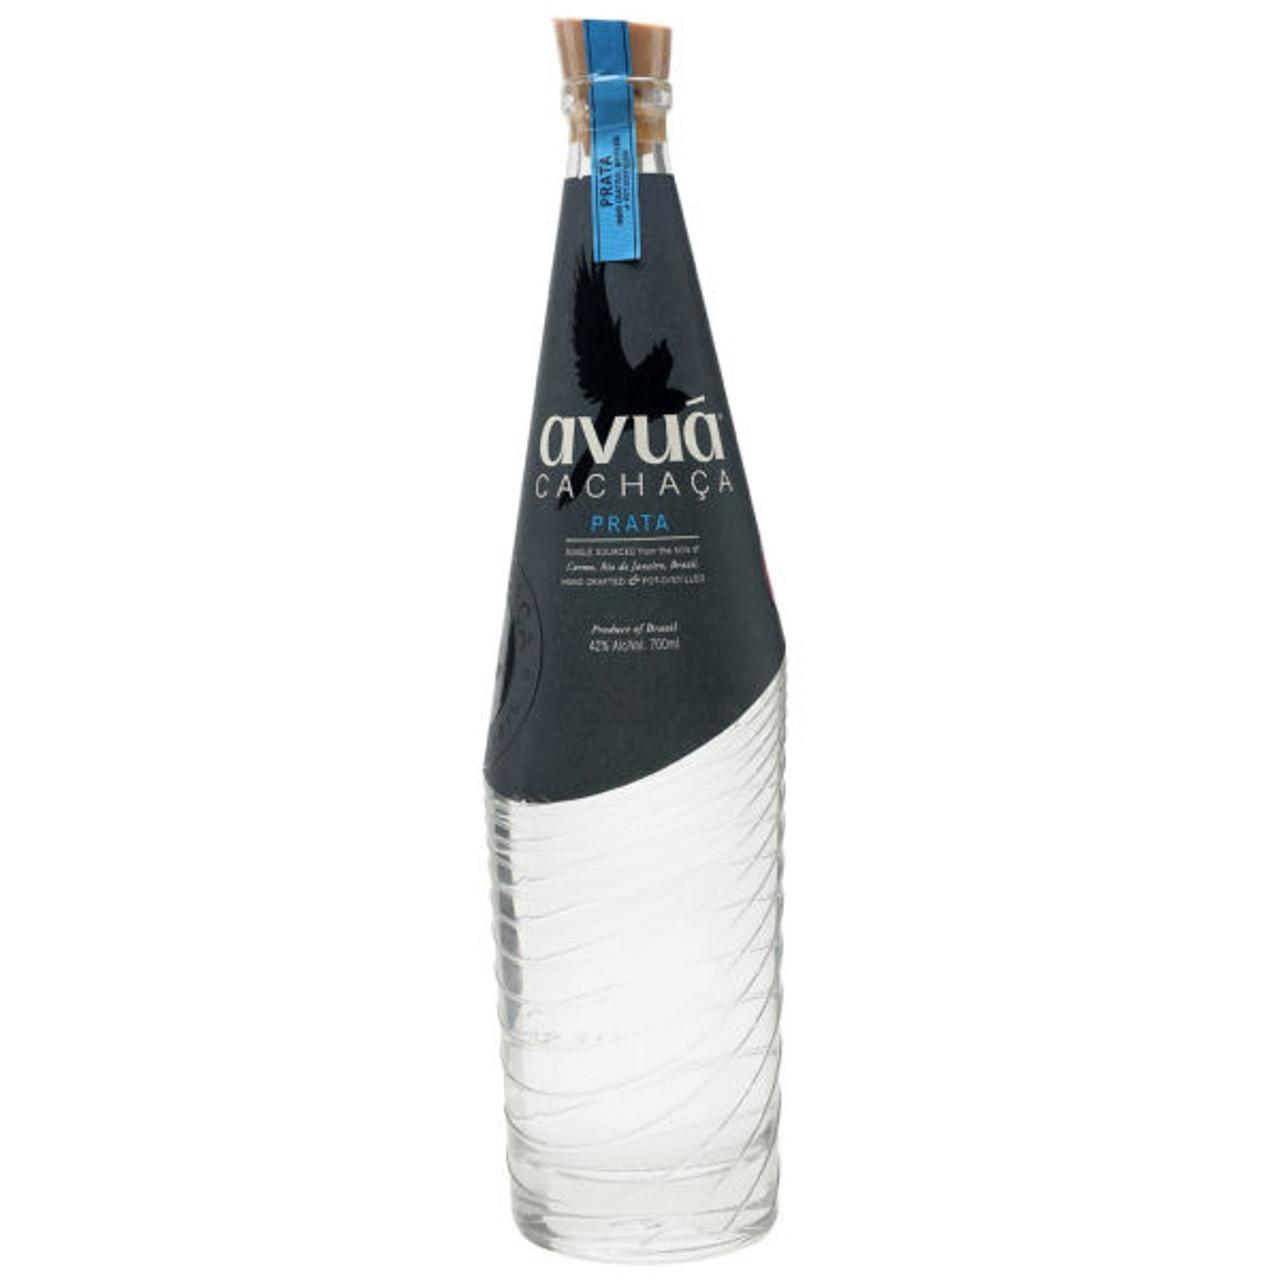 Avua Prata Cachaca Brazilian Rum 750ml